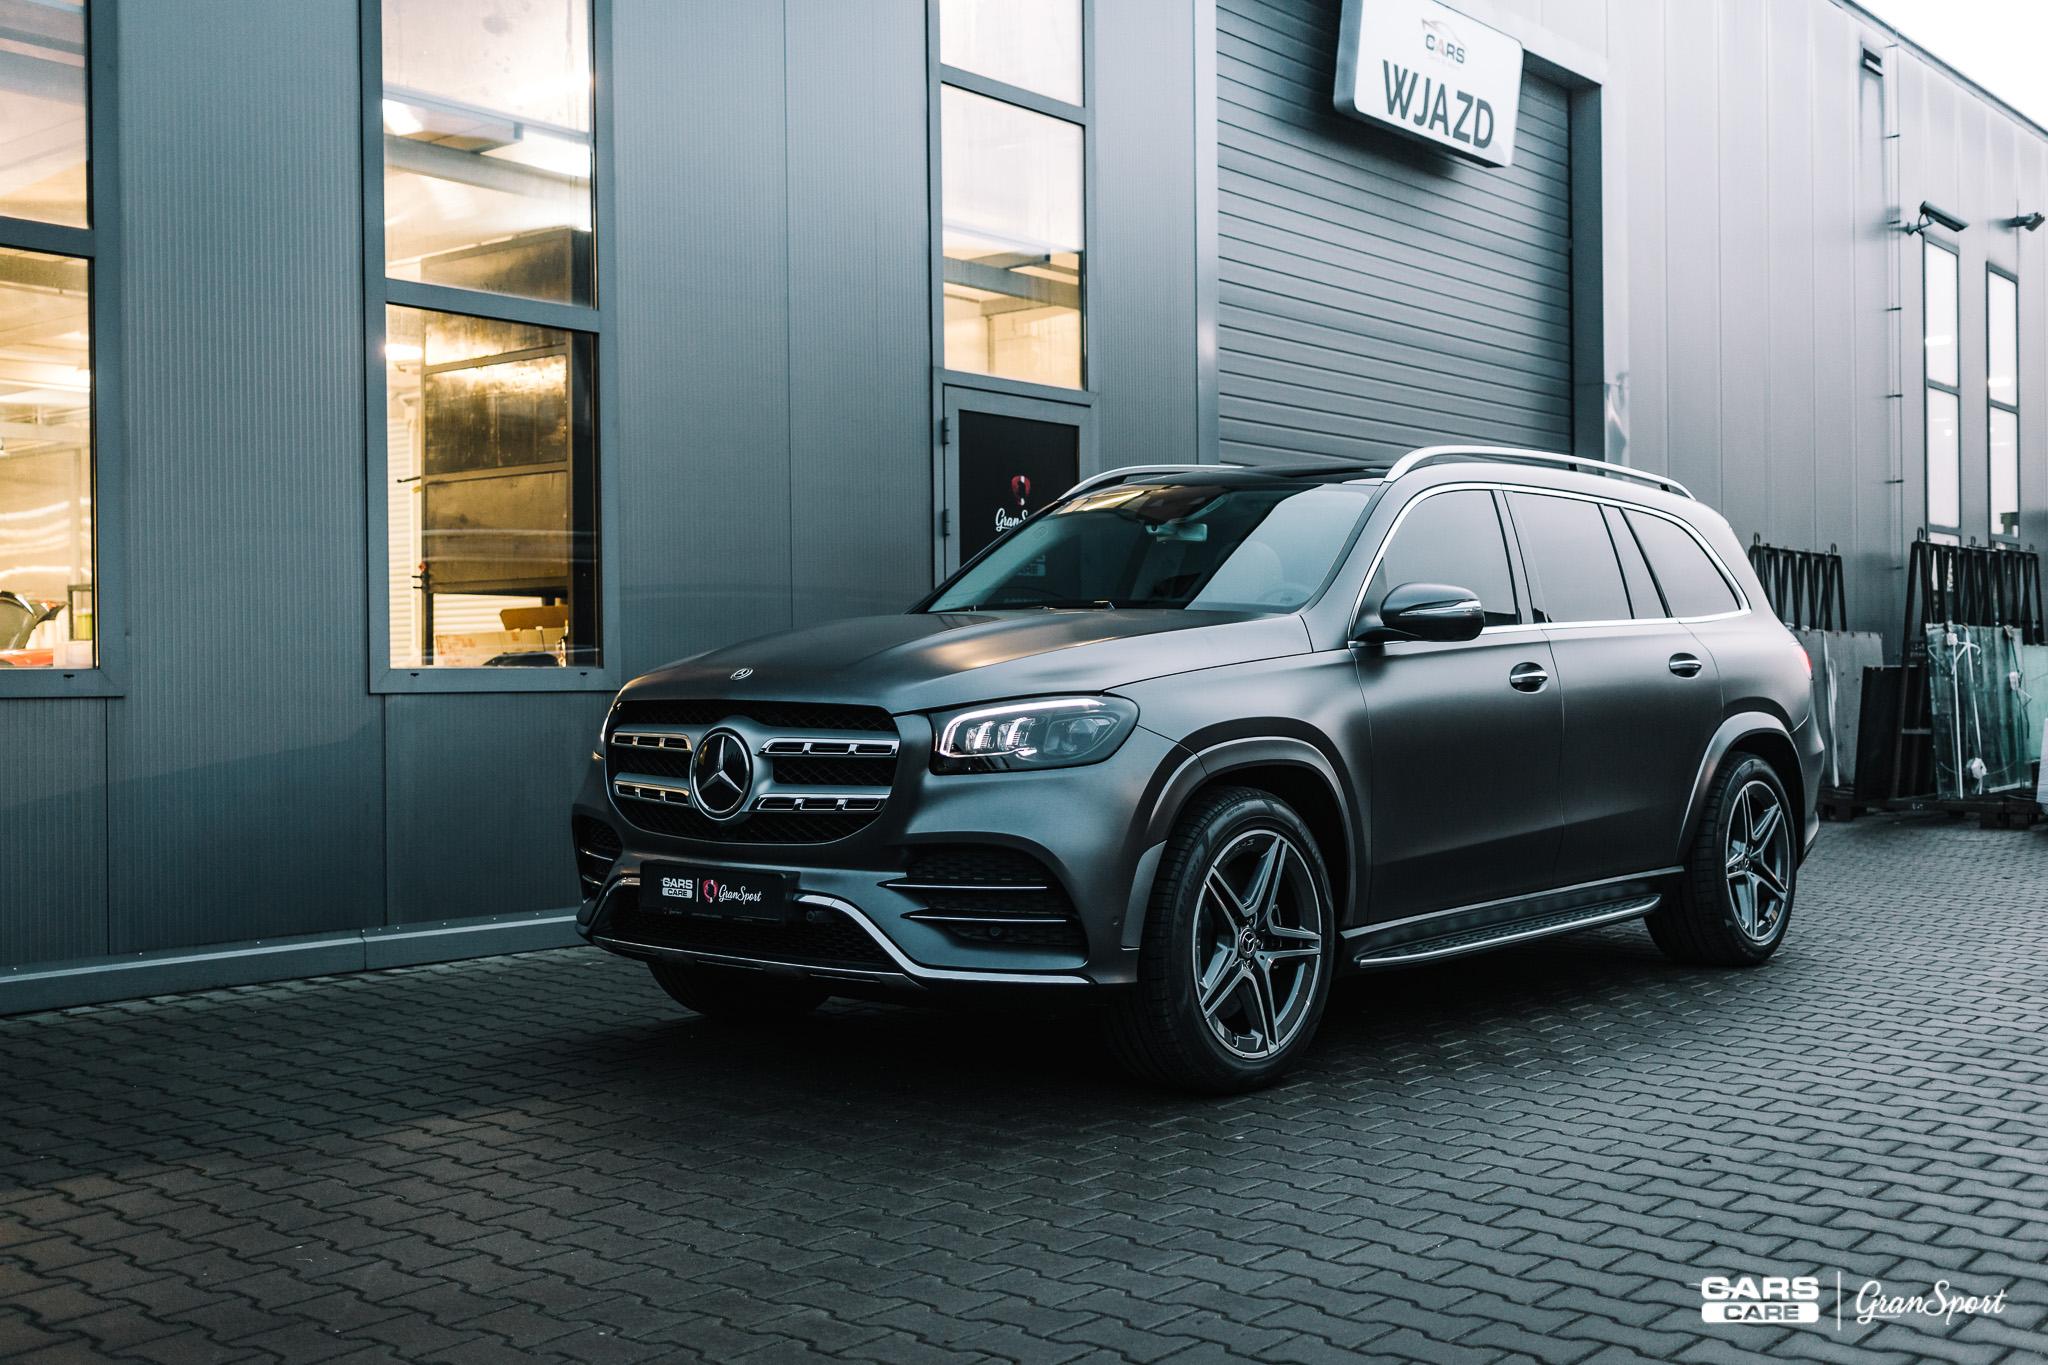 Mercedes-Benz GLS - Zmiana koloru auta folią - carscare.pl